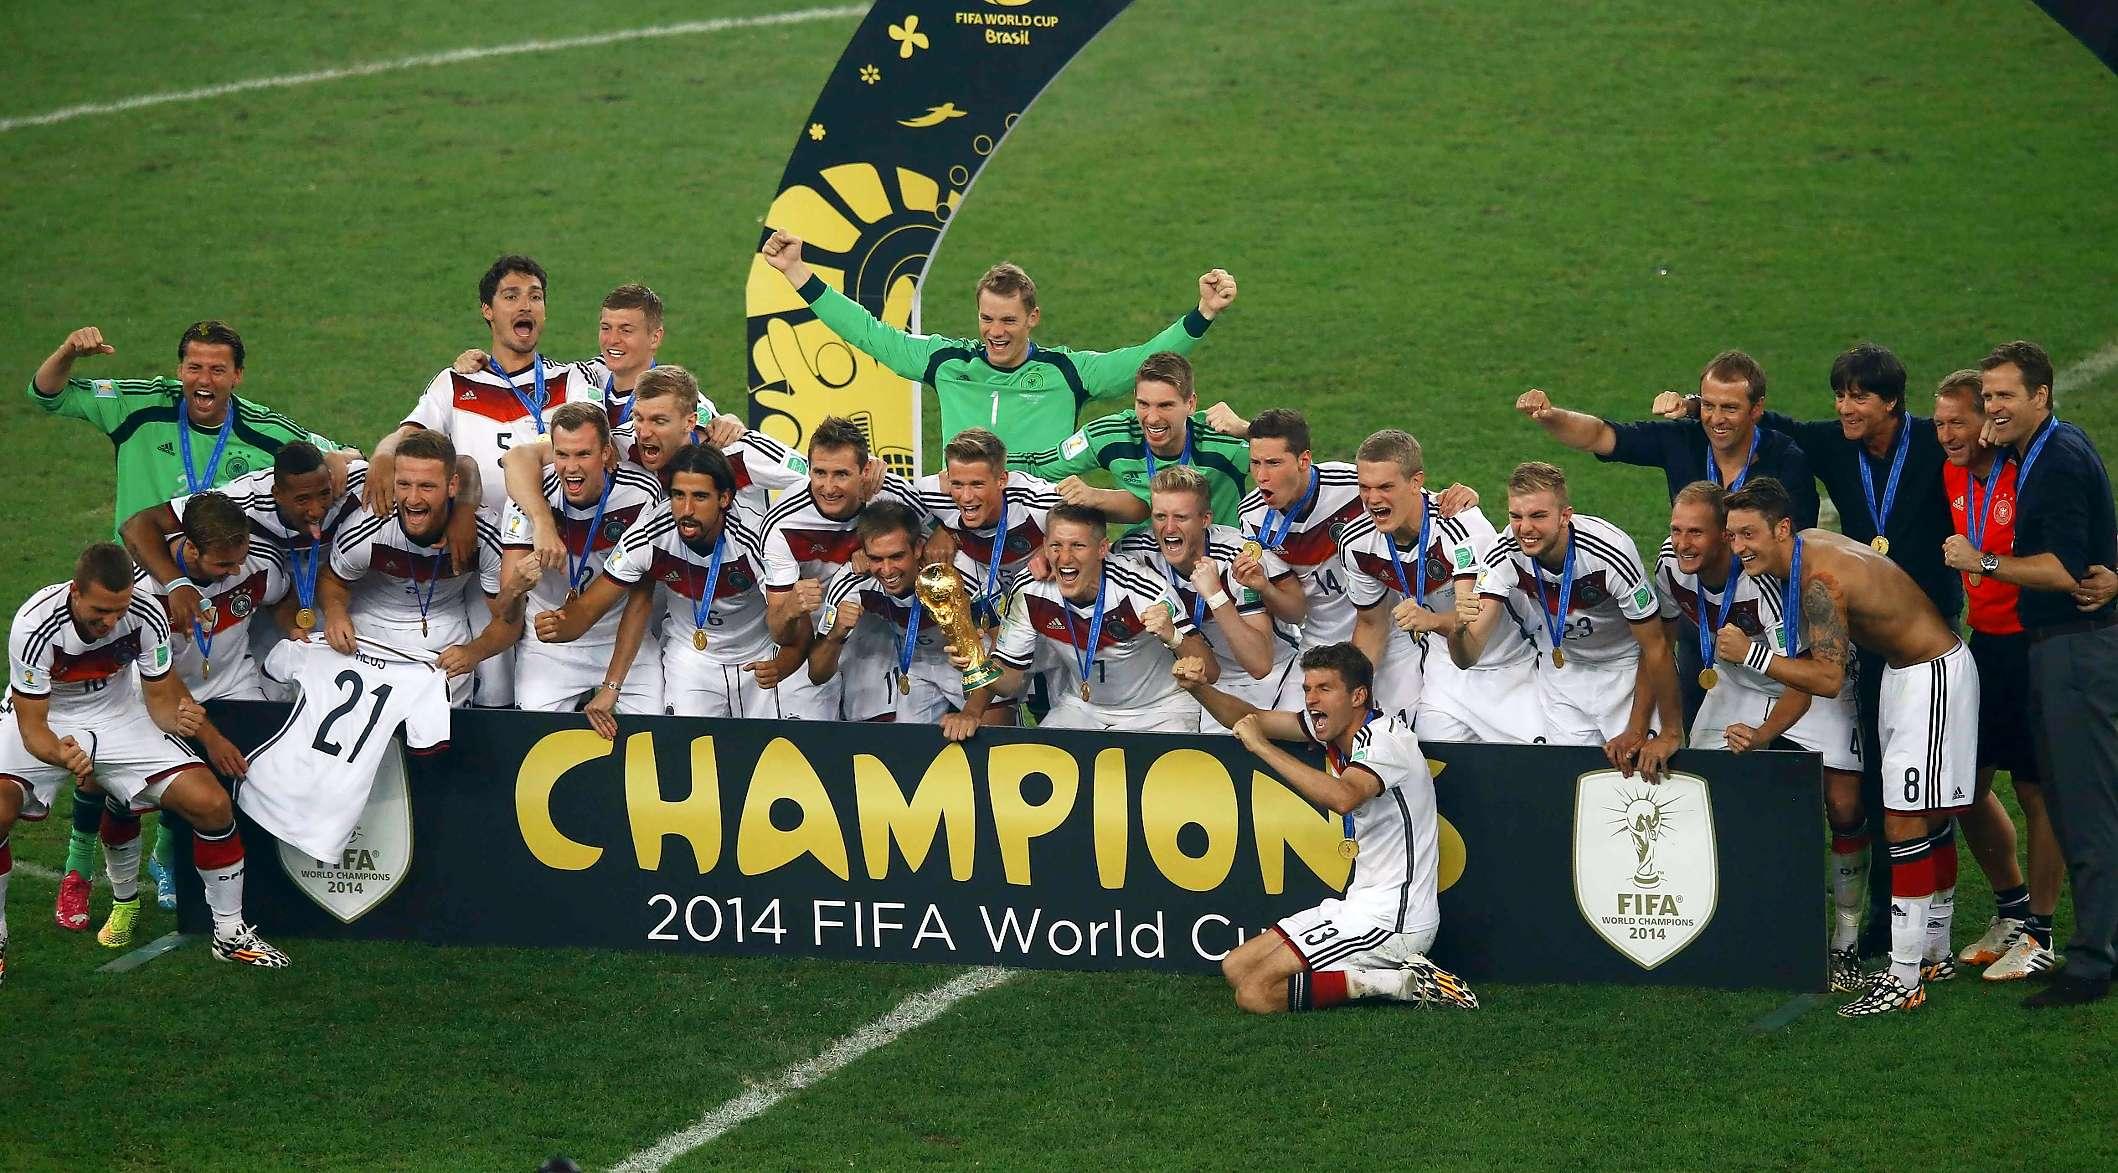 Adidas Germany DfB T Shirt Home coming 2014 white 4 stars